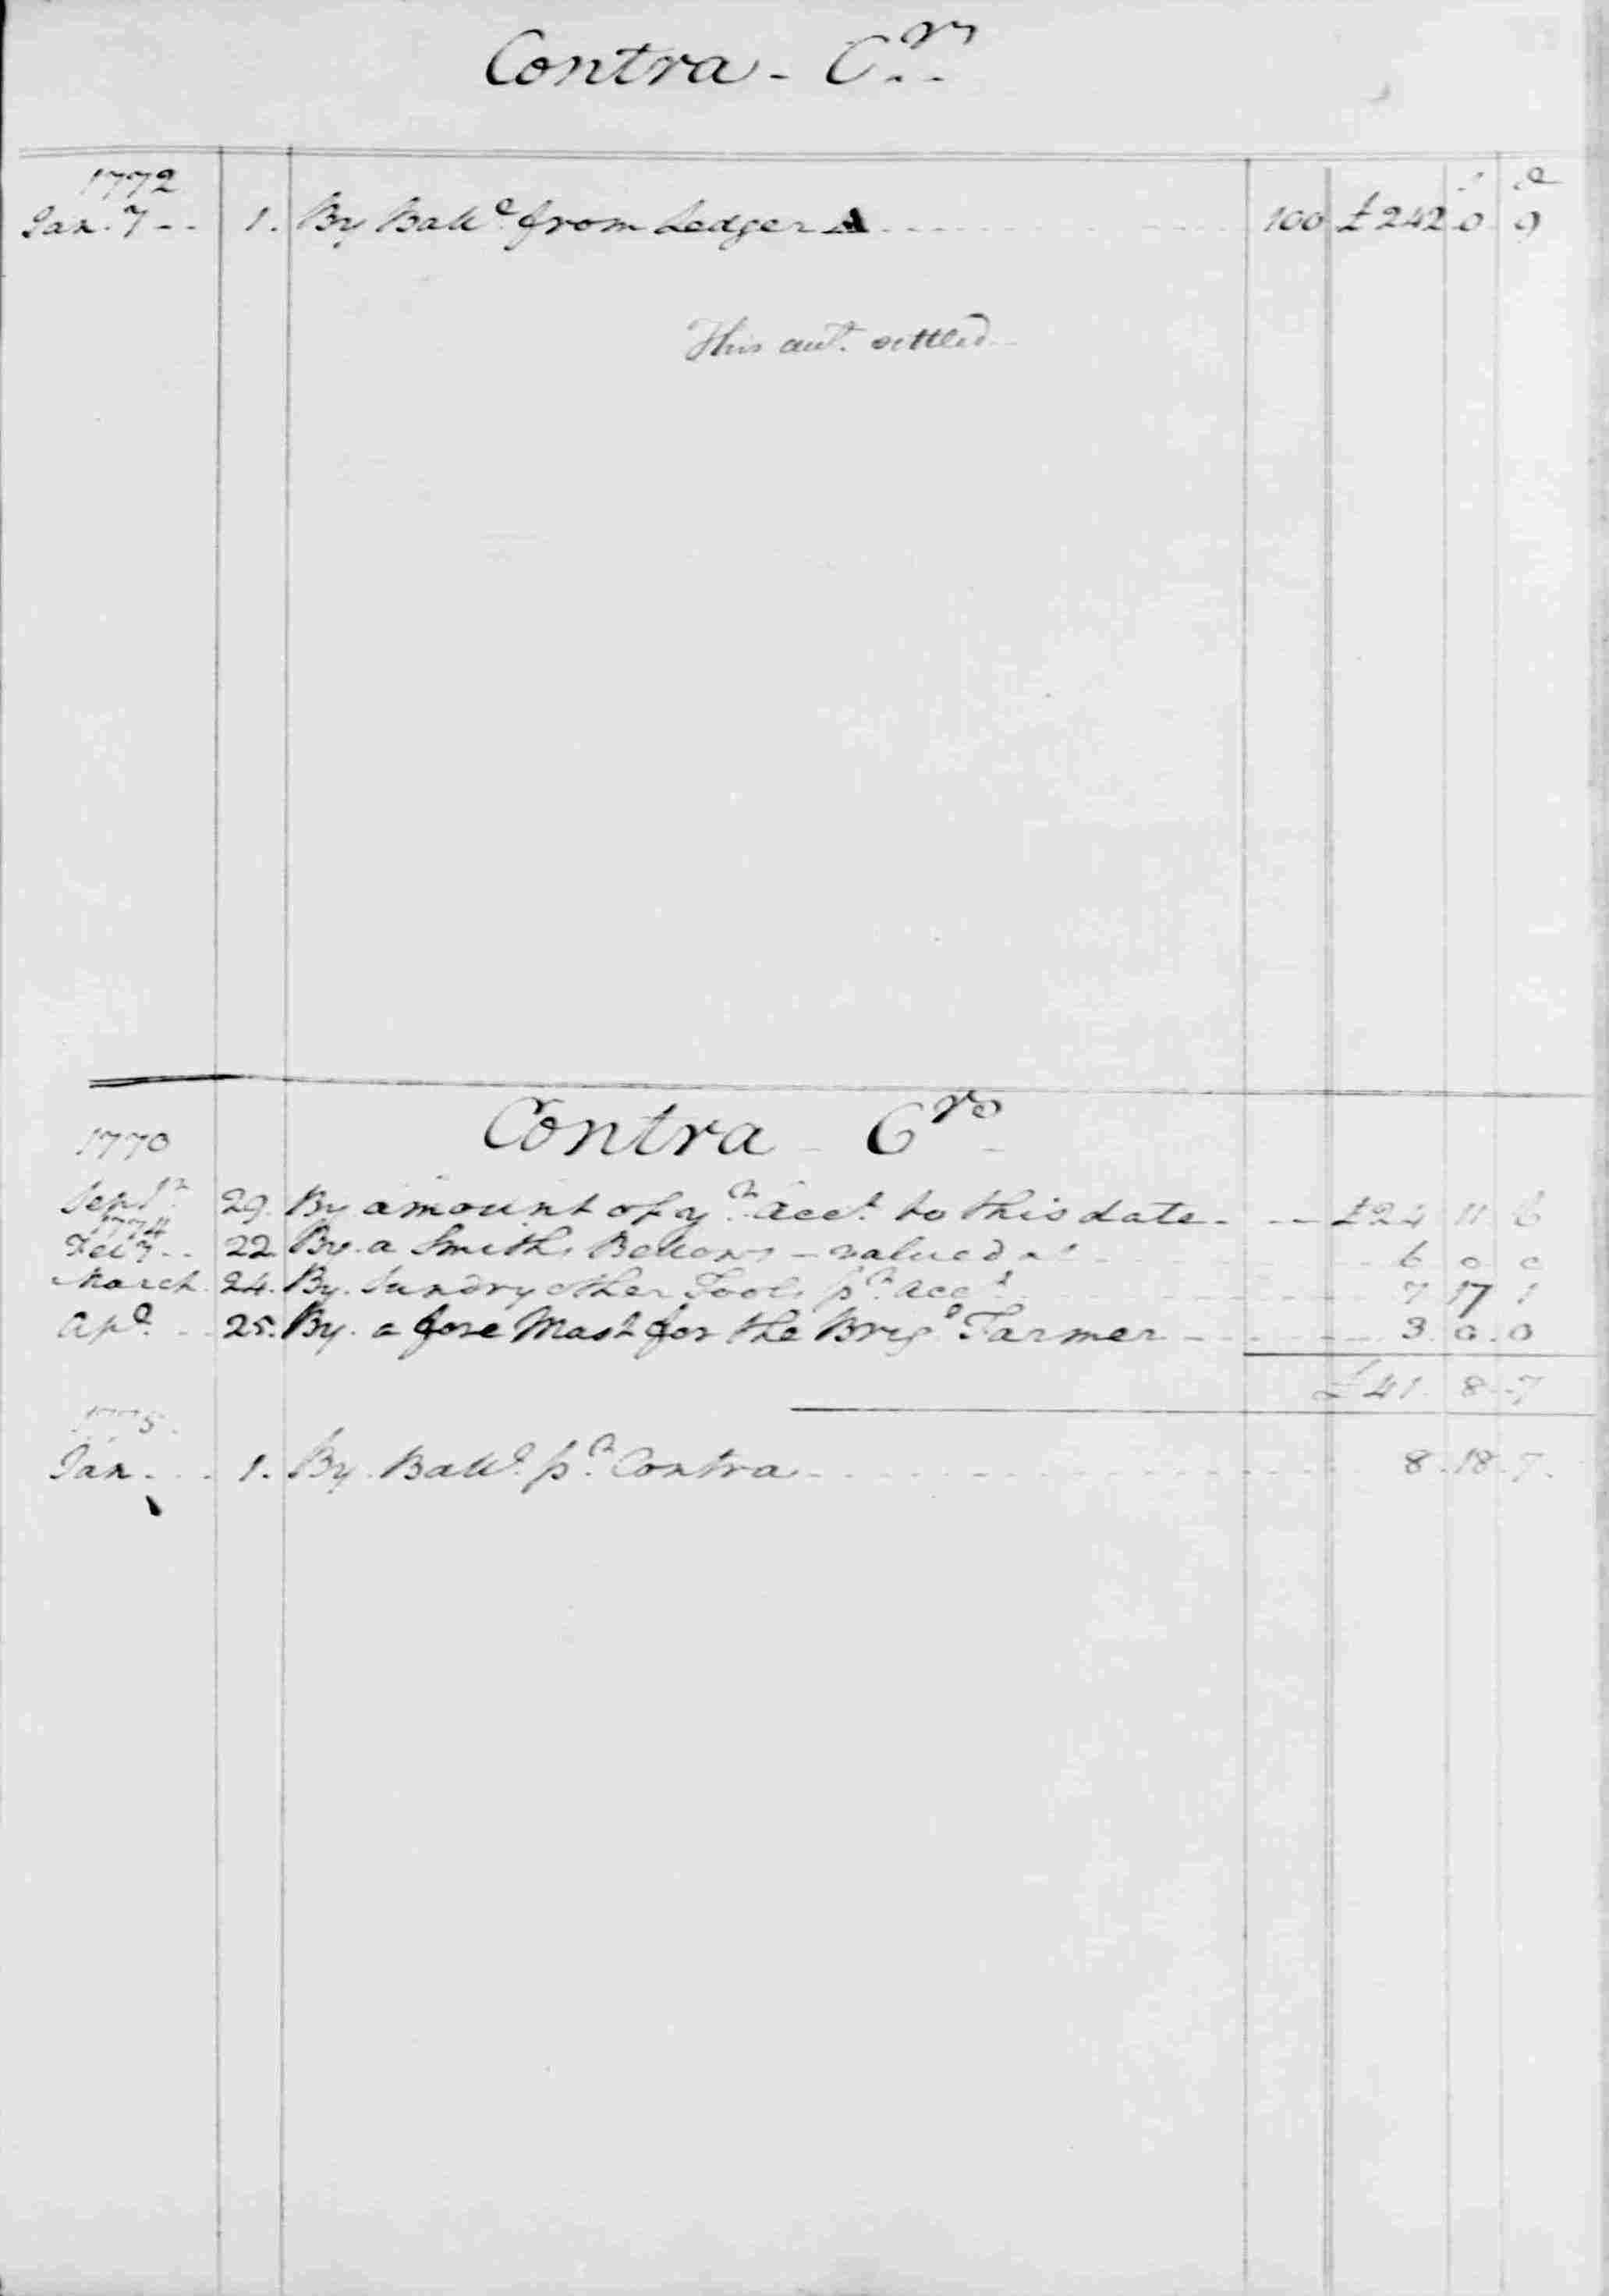 Ledger B, folio 10, right side